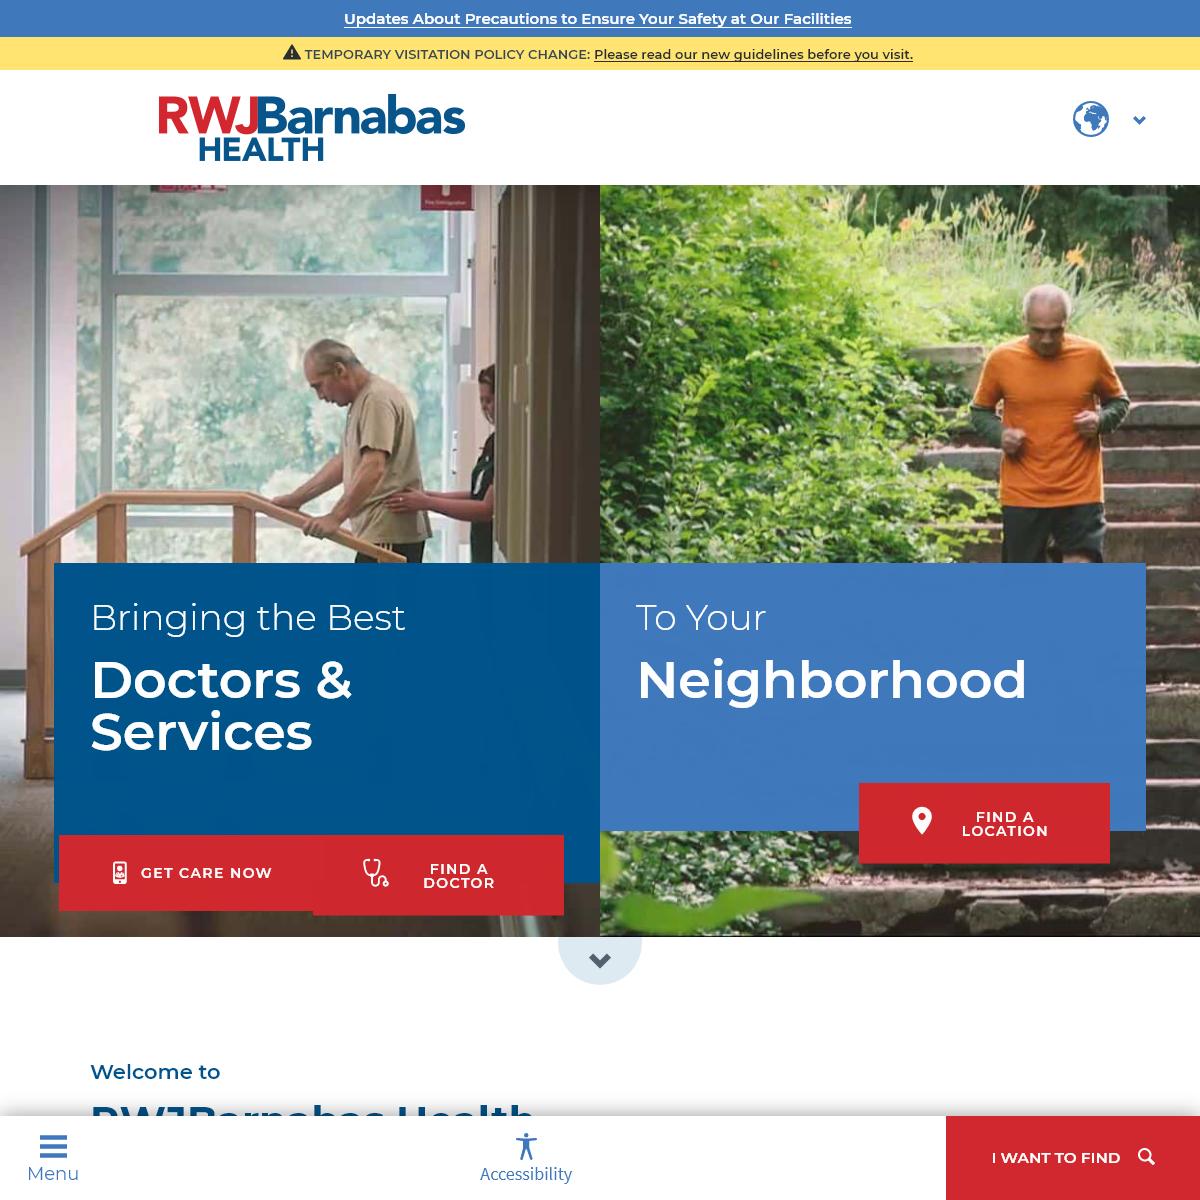 RWJBarnabas Health - Comprehensive Healthcare in New Jersey